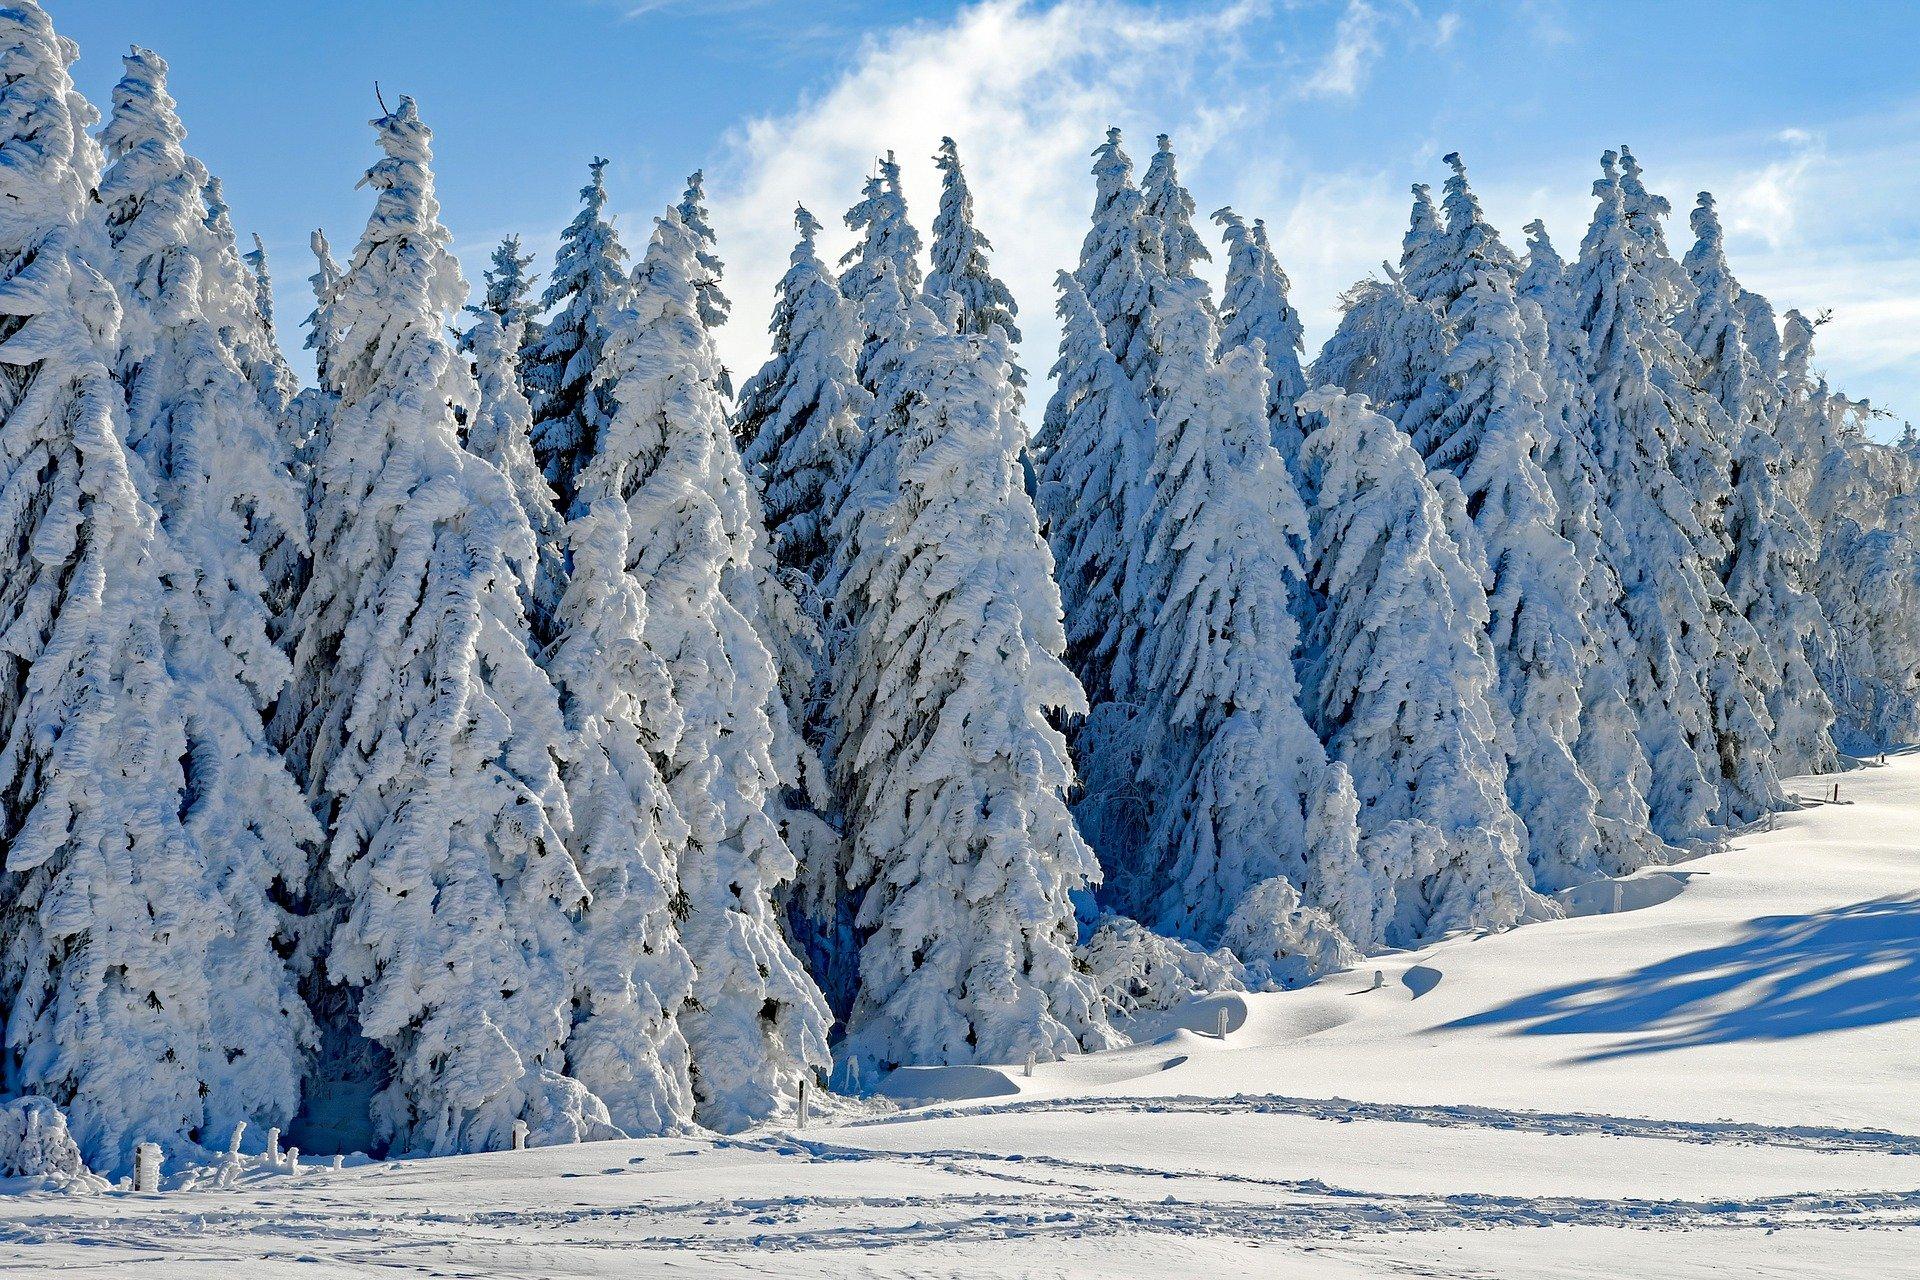 Sibérie Hivernal Neige Sapins - Couleur - GeekAnimea